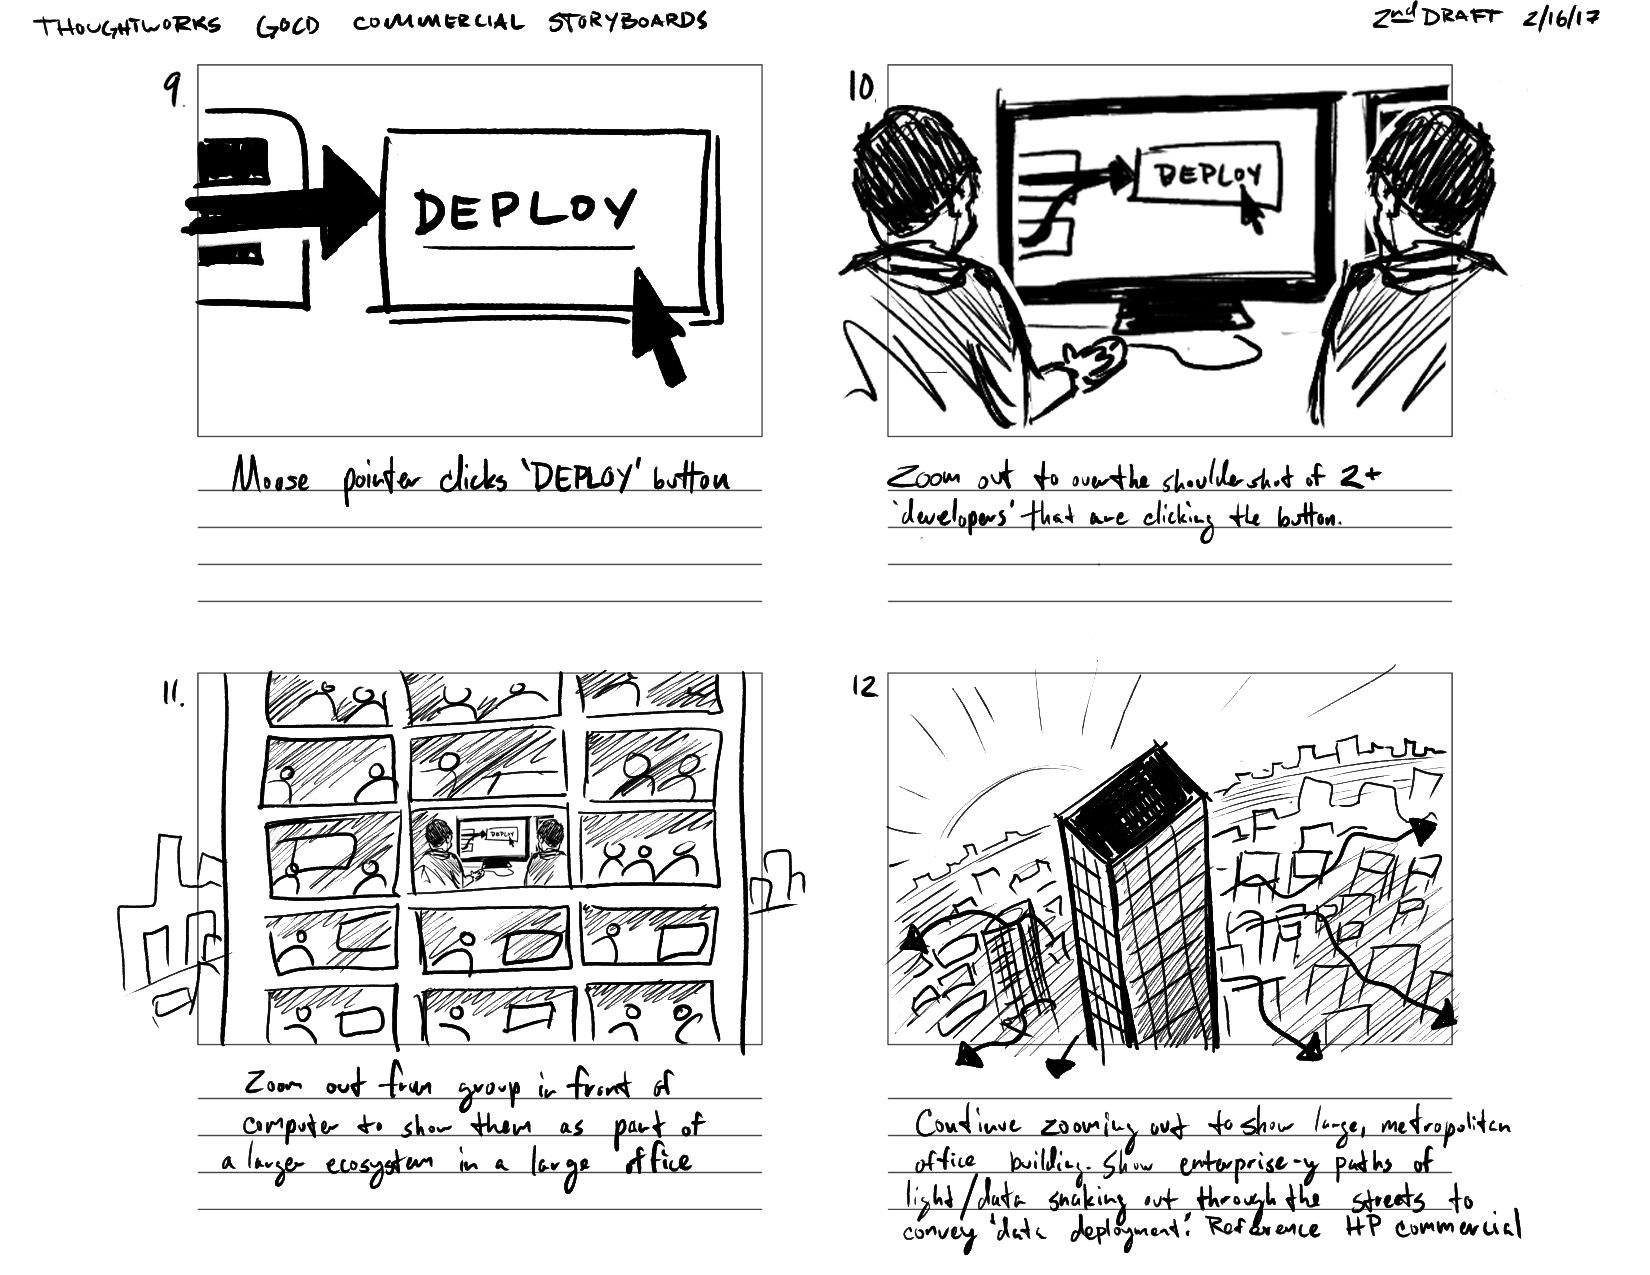 gocd_commercial_storyboard_draft2_3of4.jpg